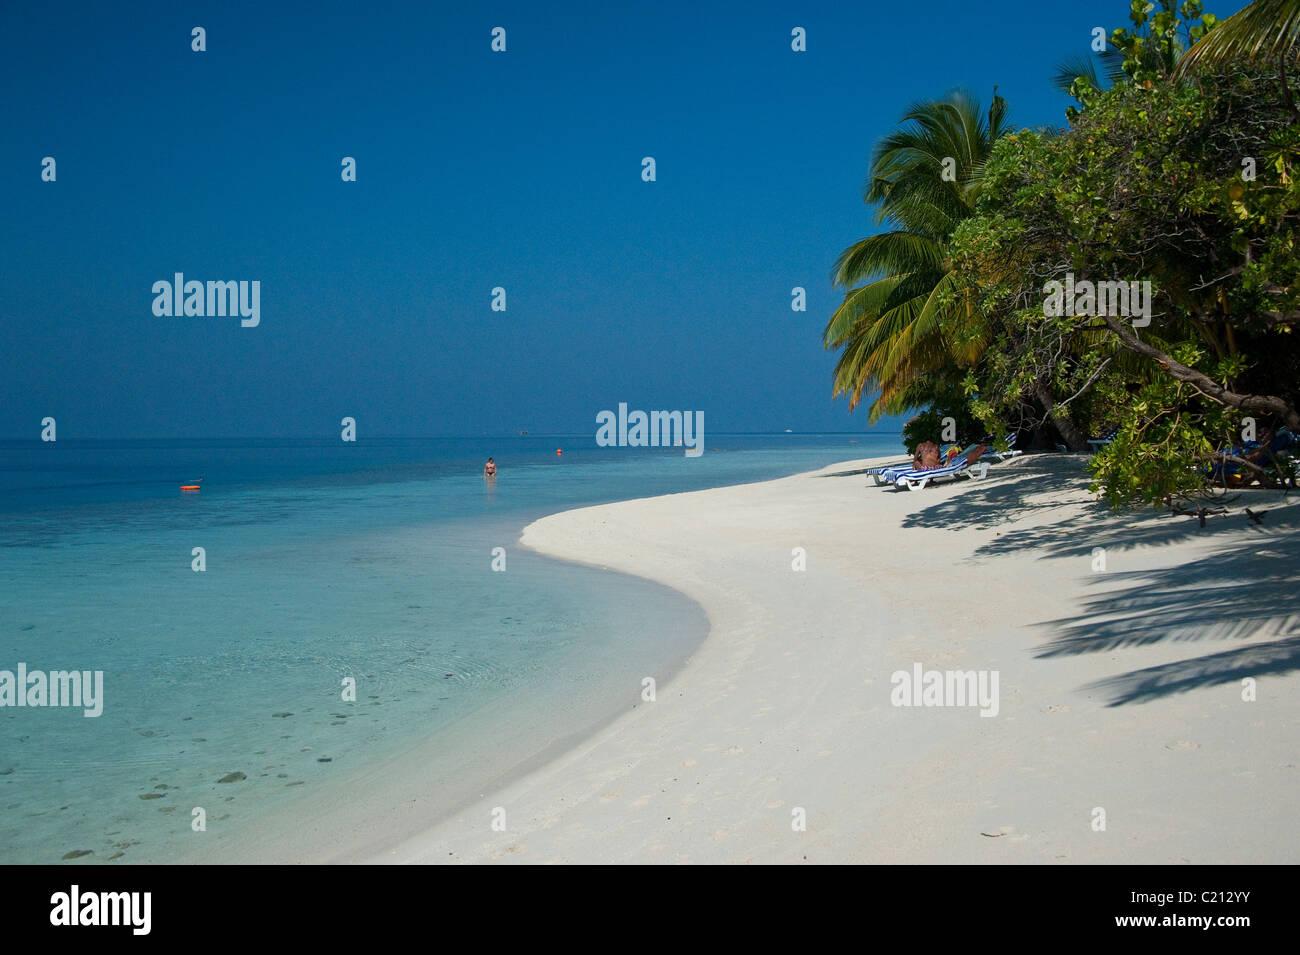 Desert island beach in the Maldives - Stock Image